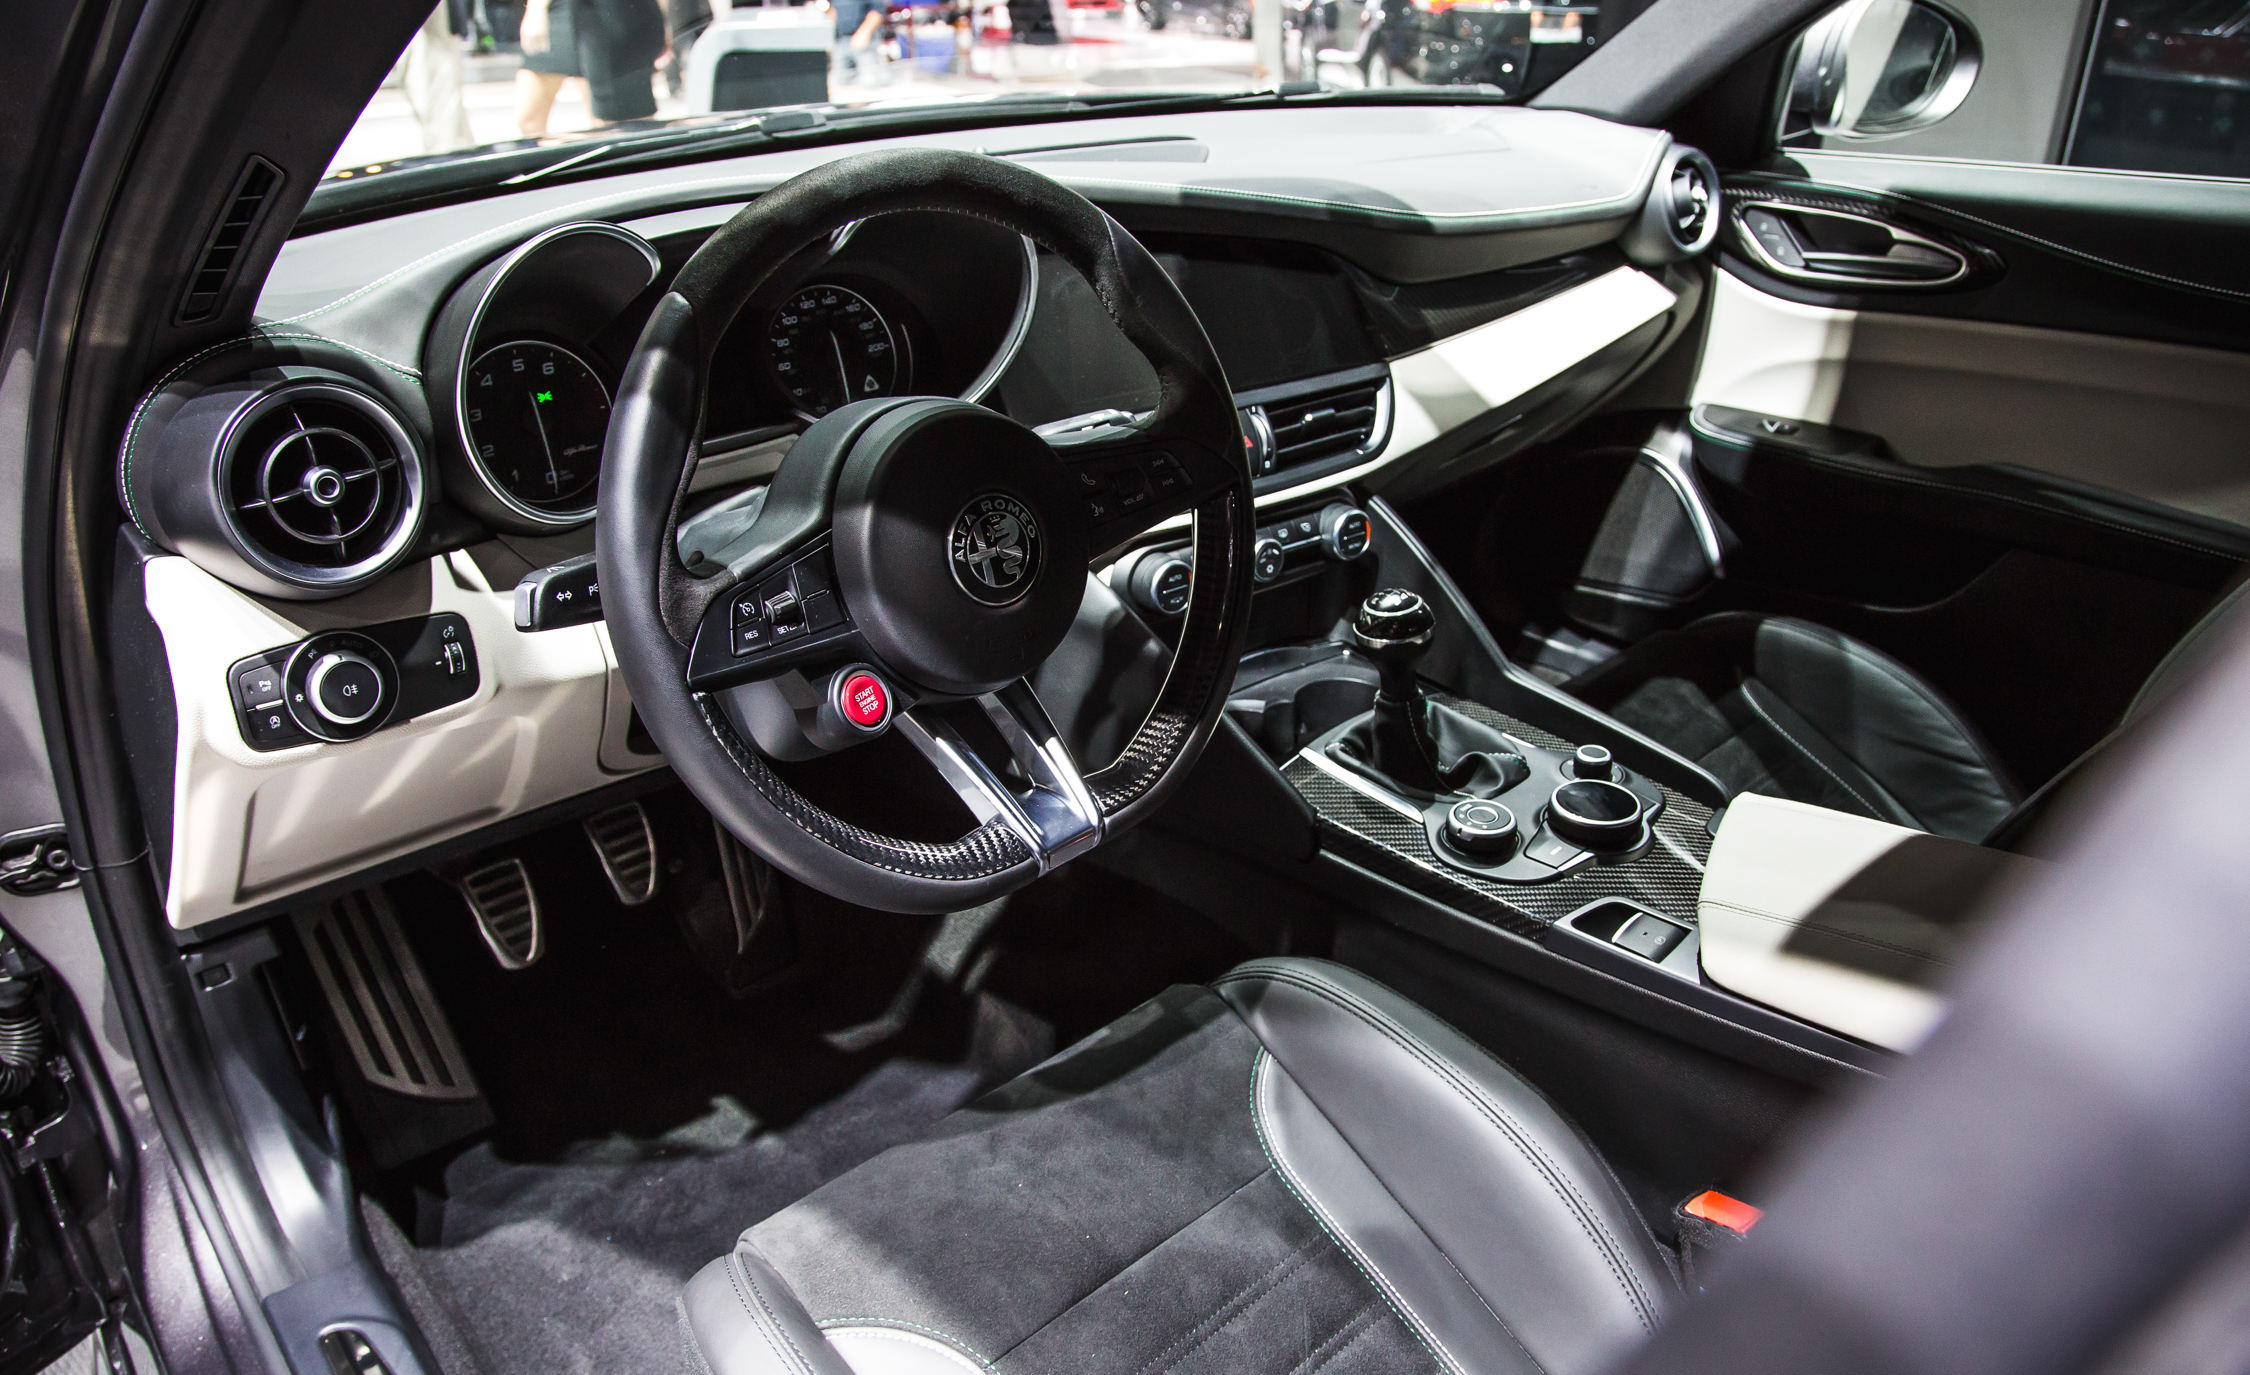 2017 Alfa Romeo Giulia Quadrifoglio Cockpit Interior